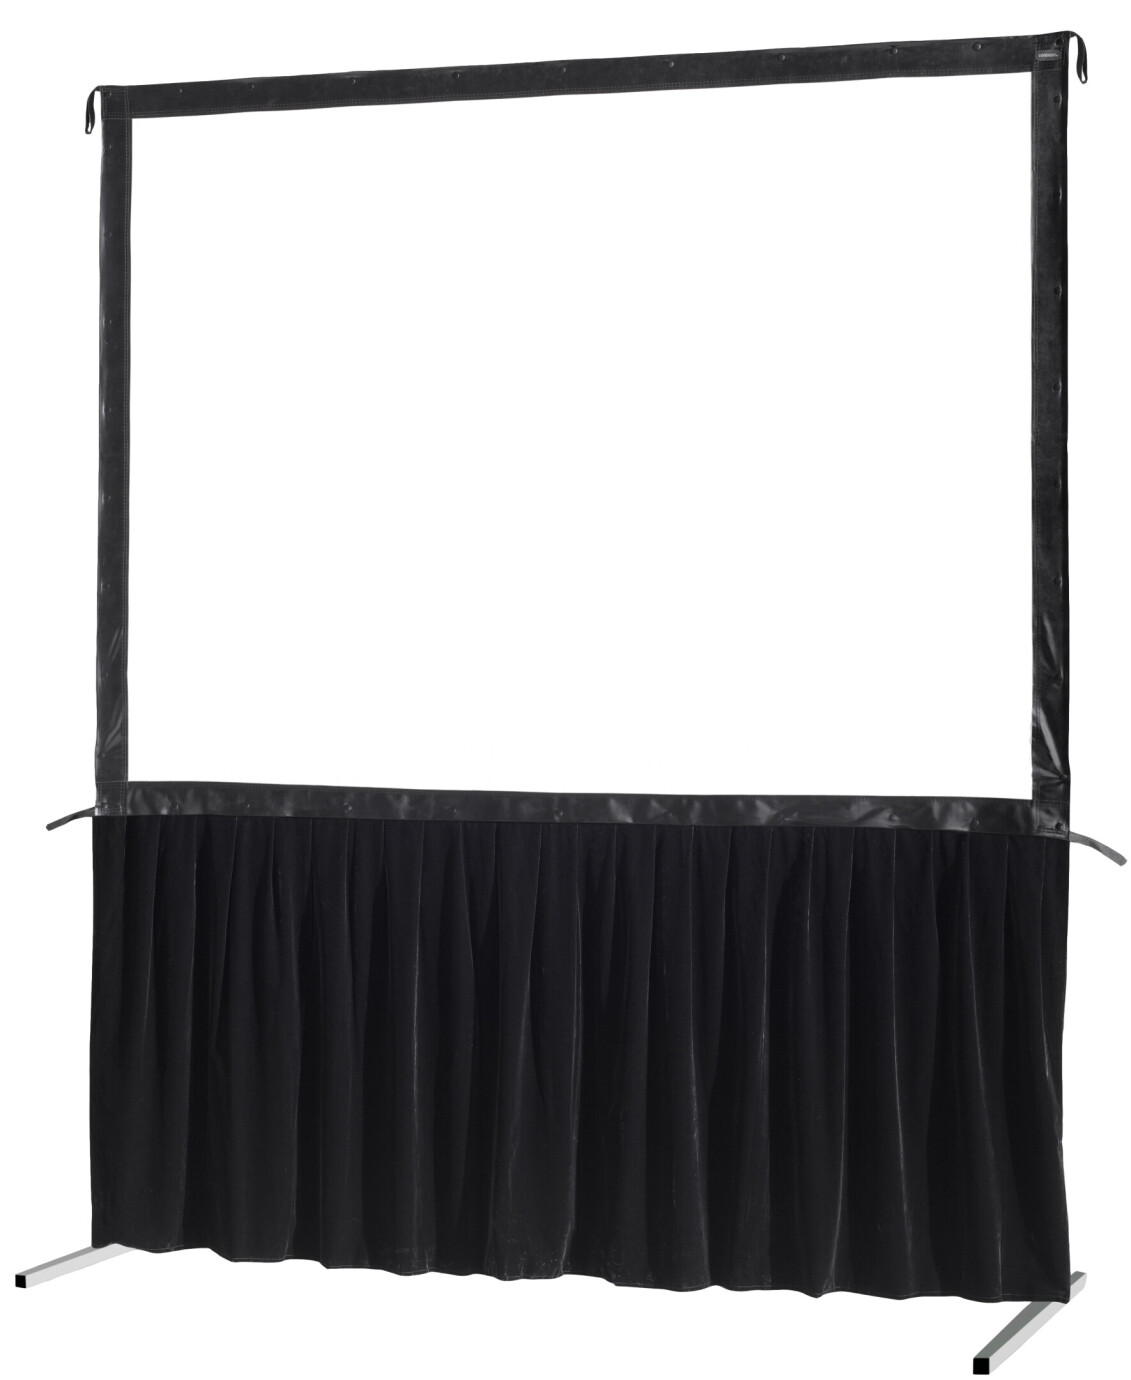 celexon Vorhangset 1-seitig für Faltrahmenleinwand Mobil Expert 406 x 254 cm